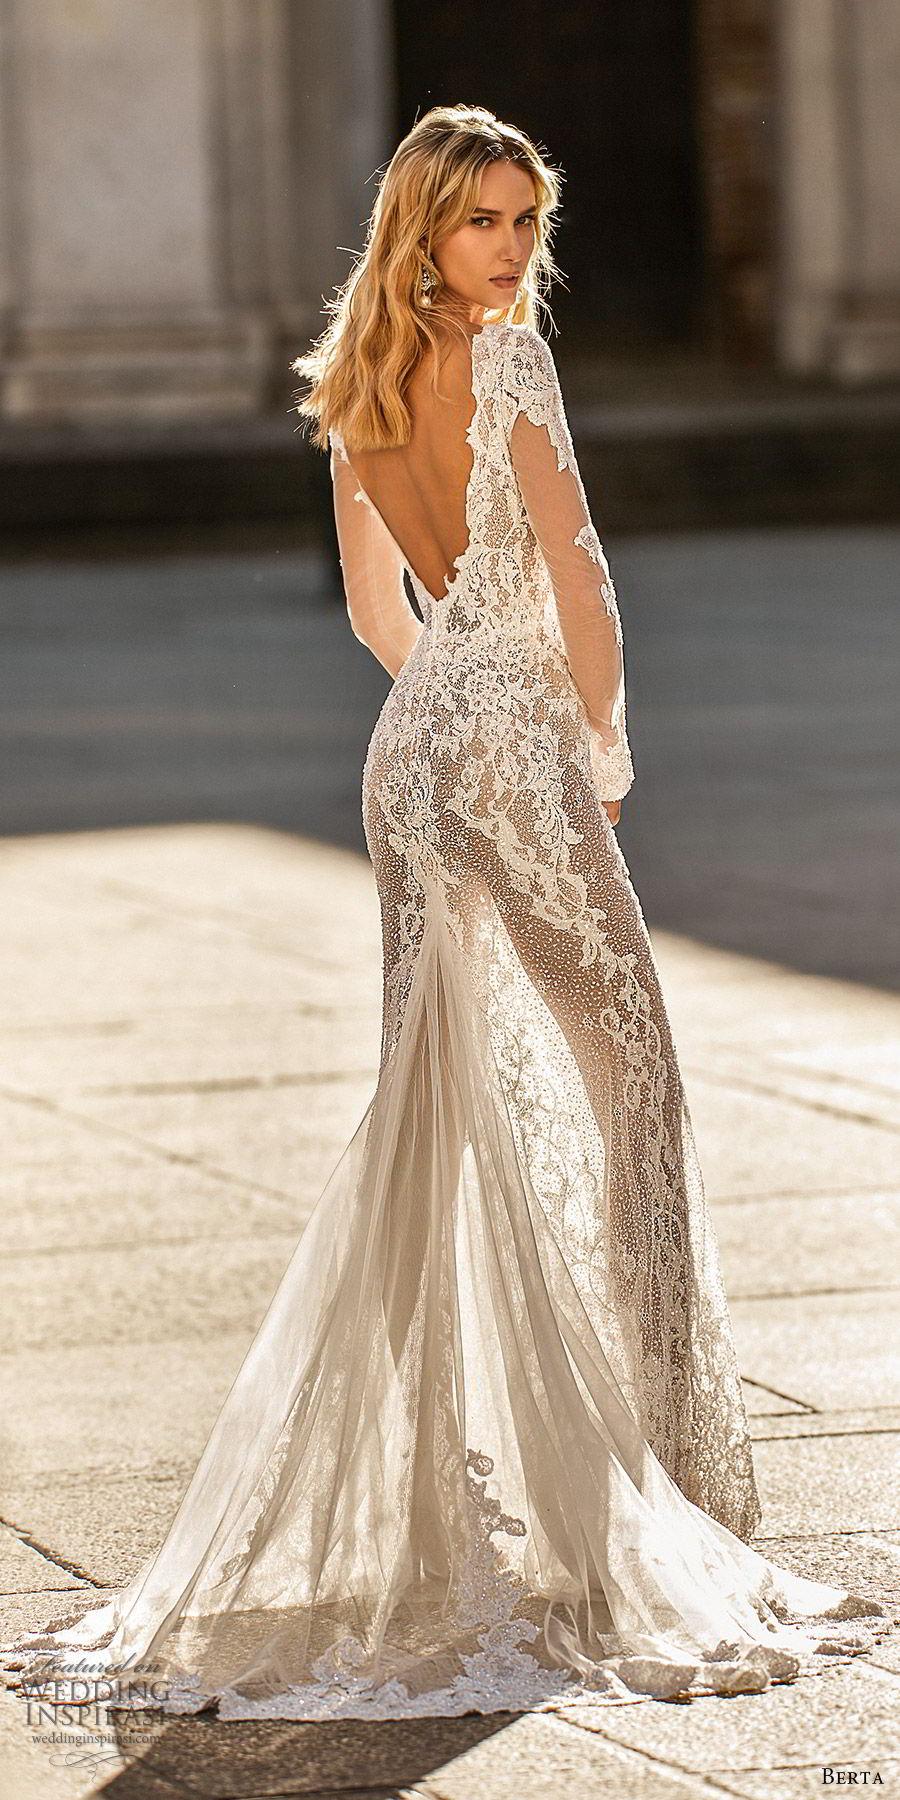 berta spring 2020 bridal illusion long flare sleeves deep v neck fully embellished lace sheath wedding dress (13) romantic elegant low back chapel train zv